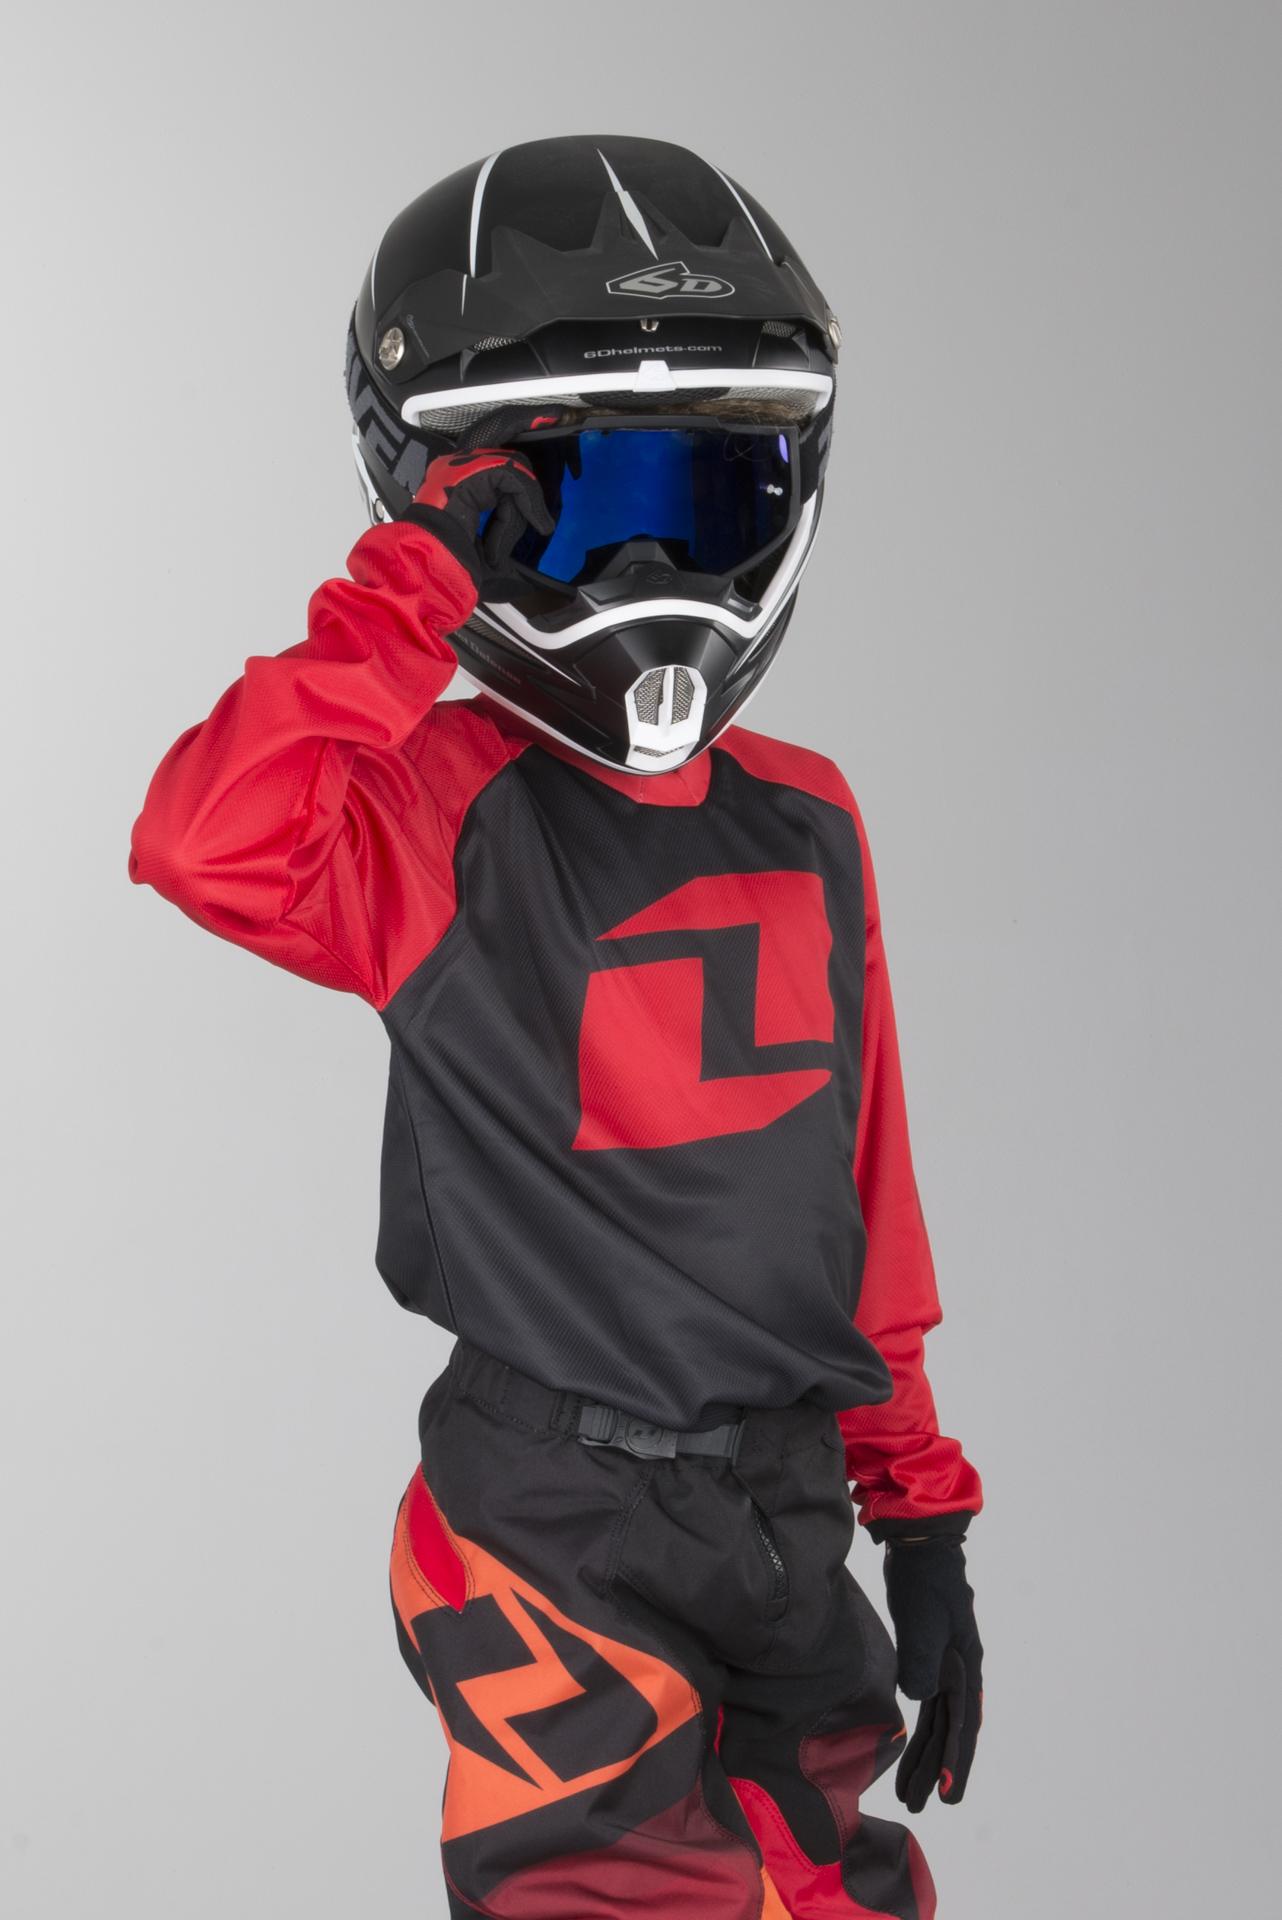 ONE INDUSTRIES VAPOR MOTOCROSS MX KIT SHIFTER RED BLACK bike pants jersey